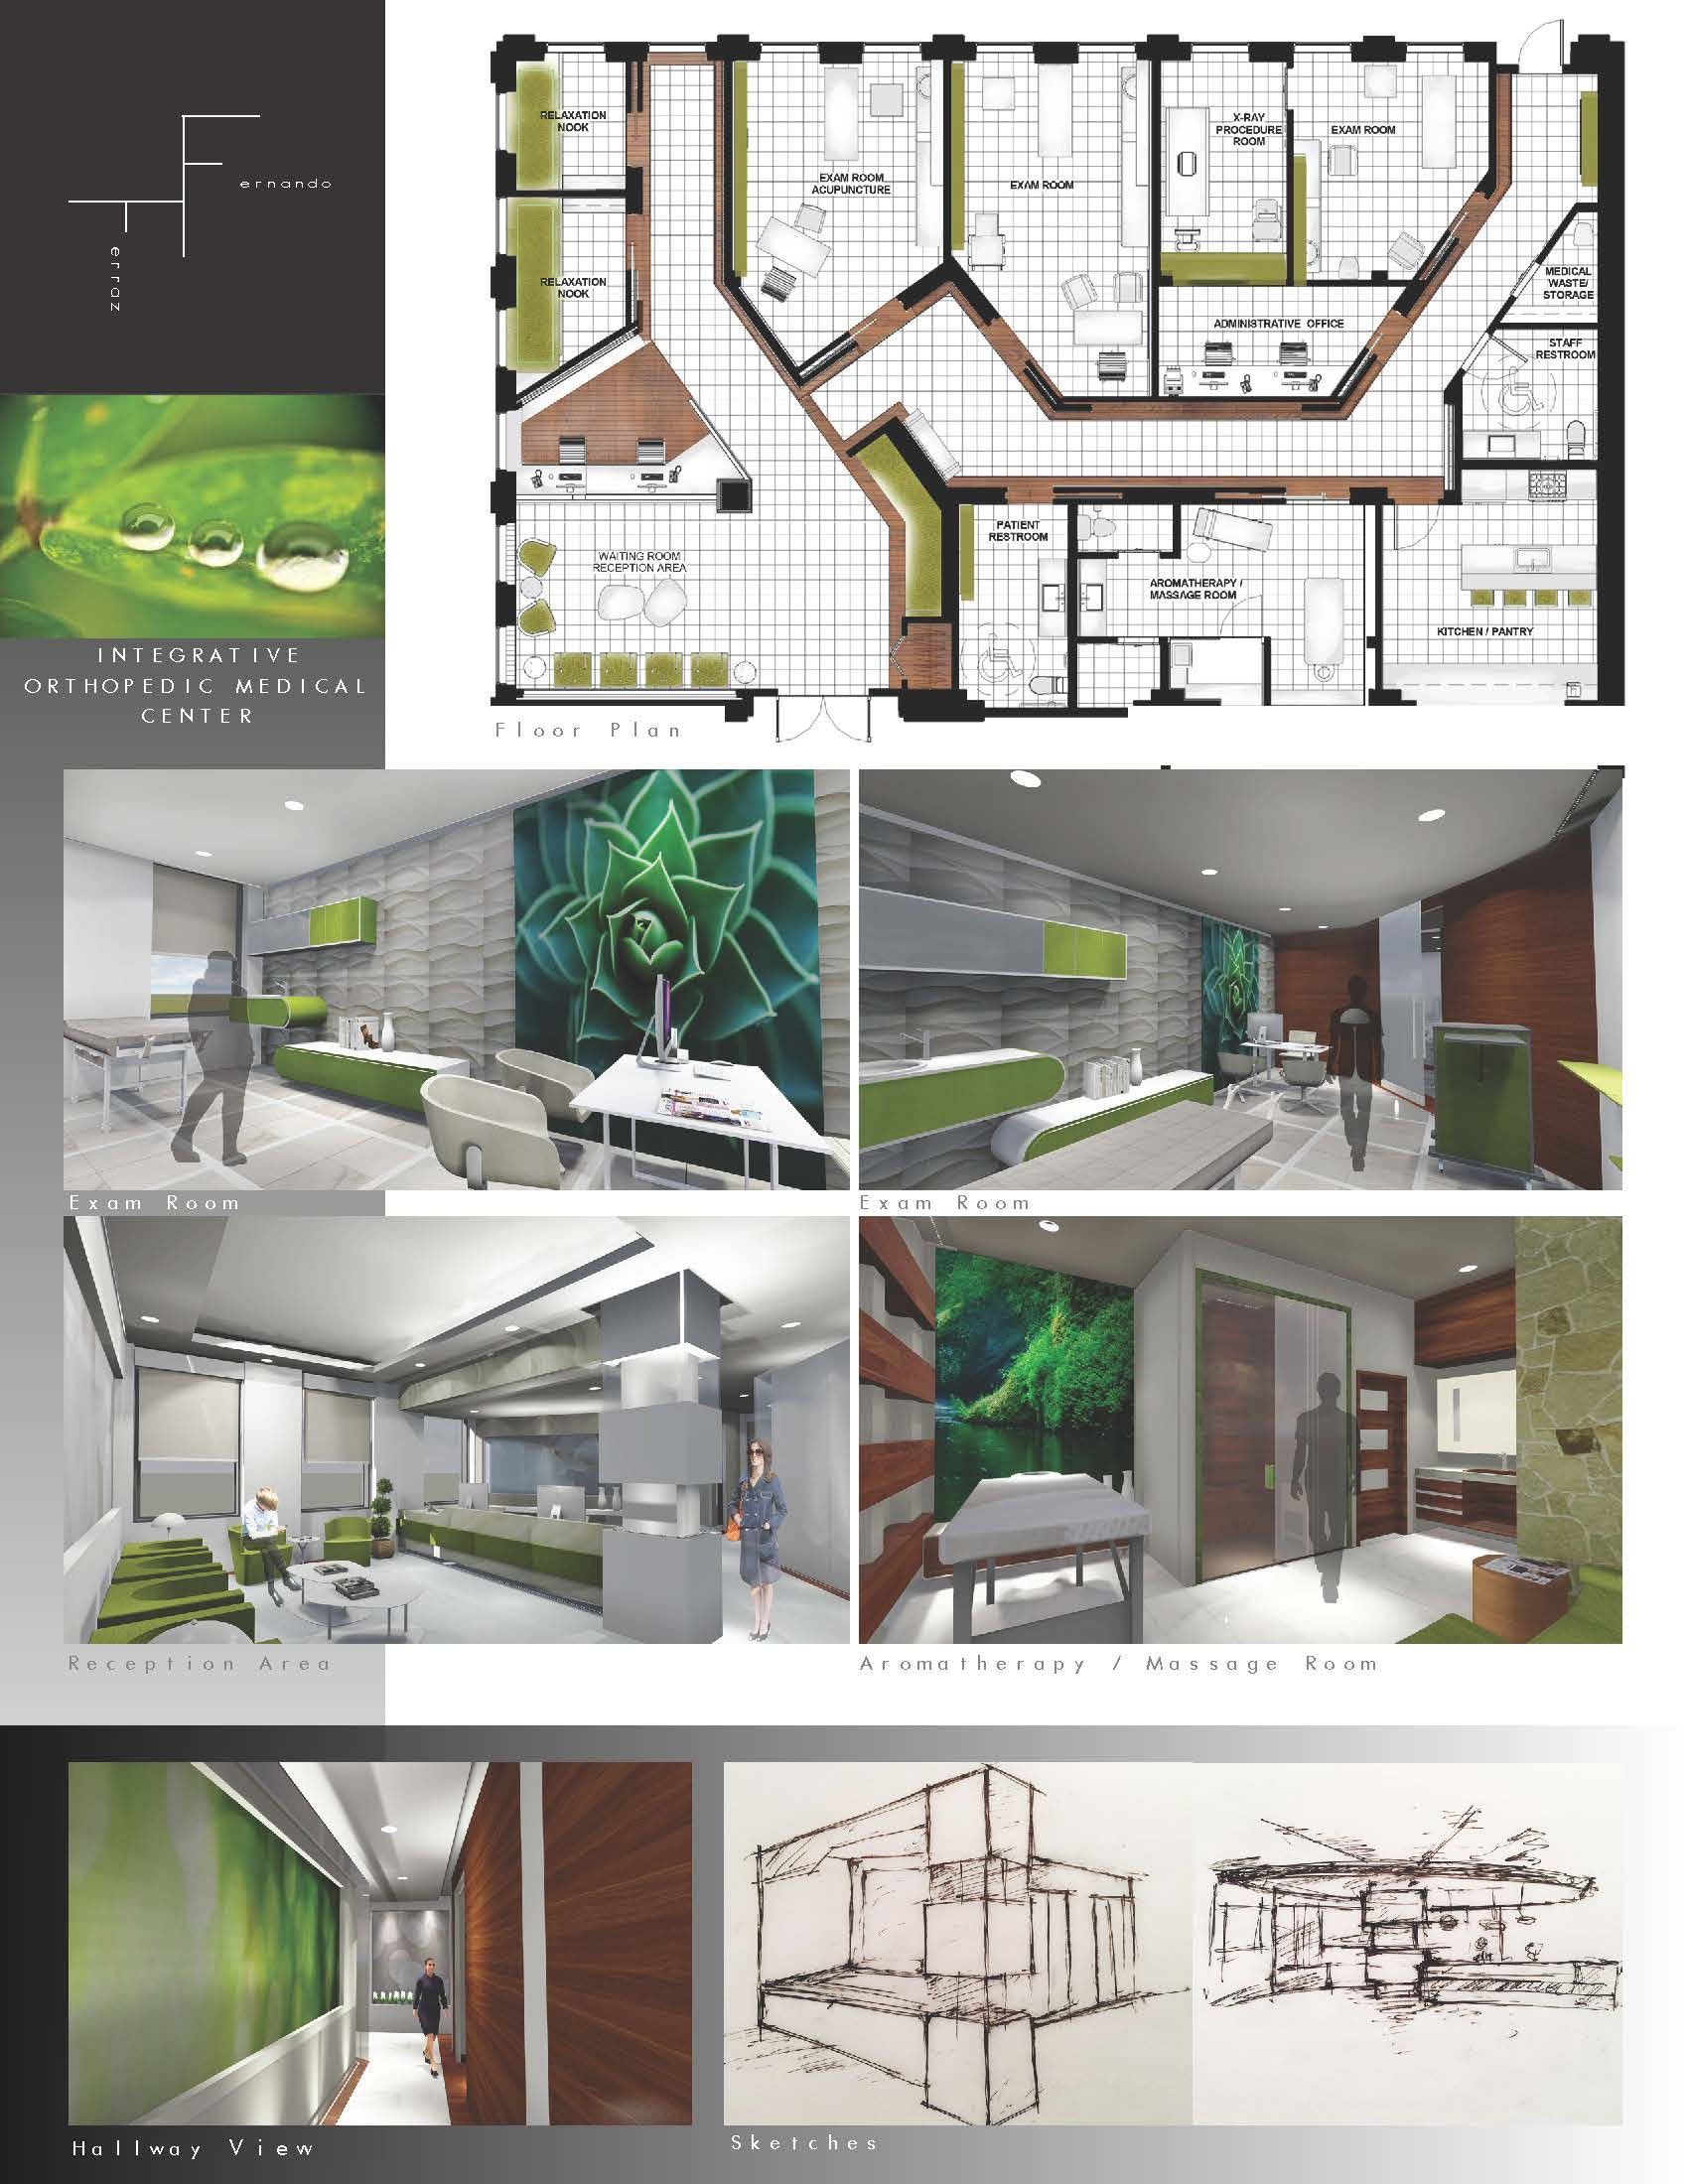 Interior Design Work Samples